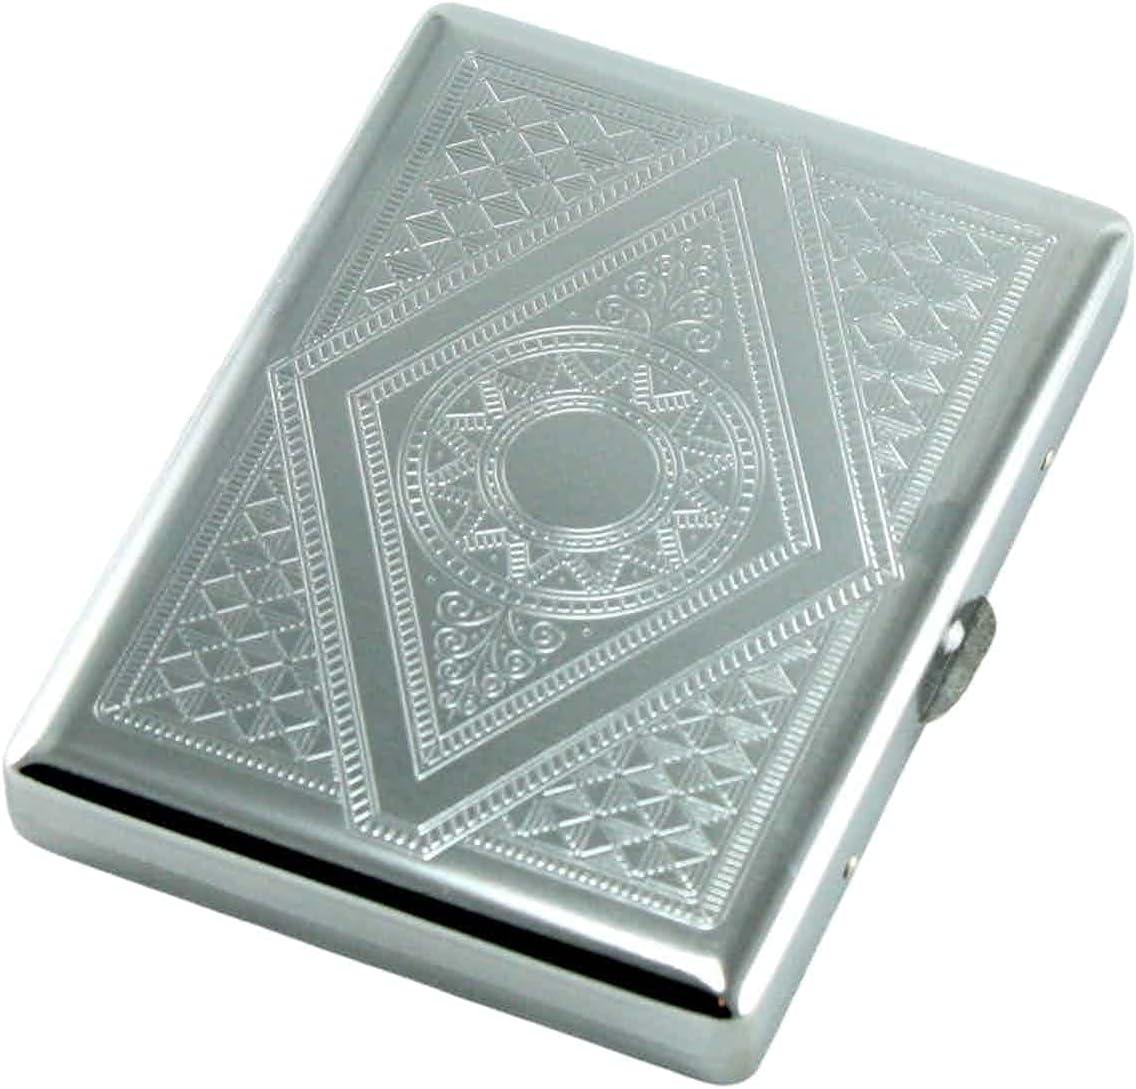 SKYWAY Barcelona Silver Cigarette Case Over item handling ☆ Double 100's for Holder - gift